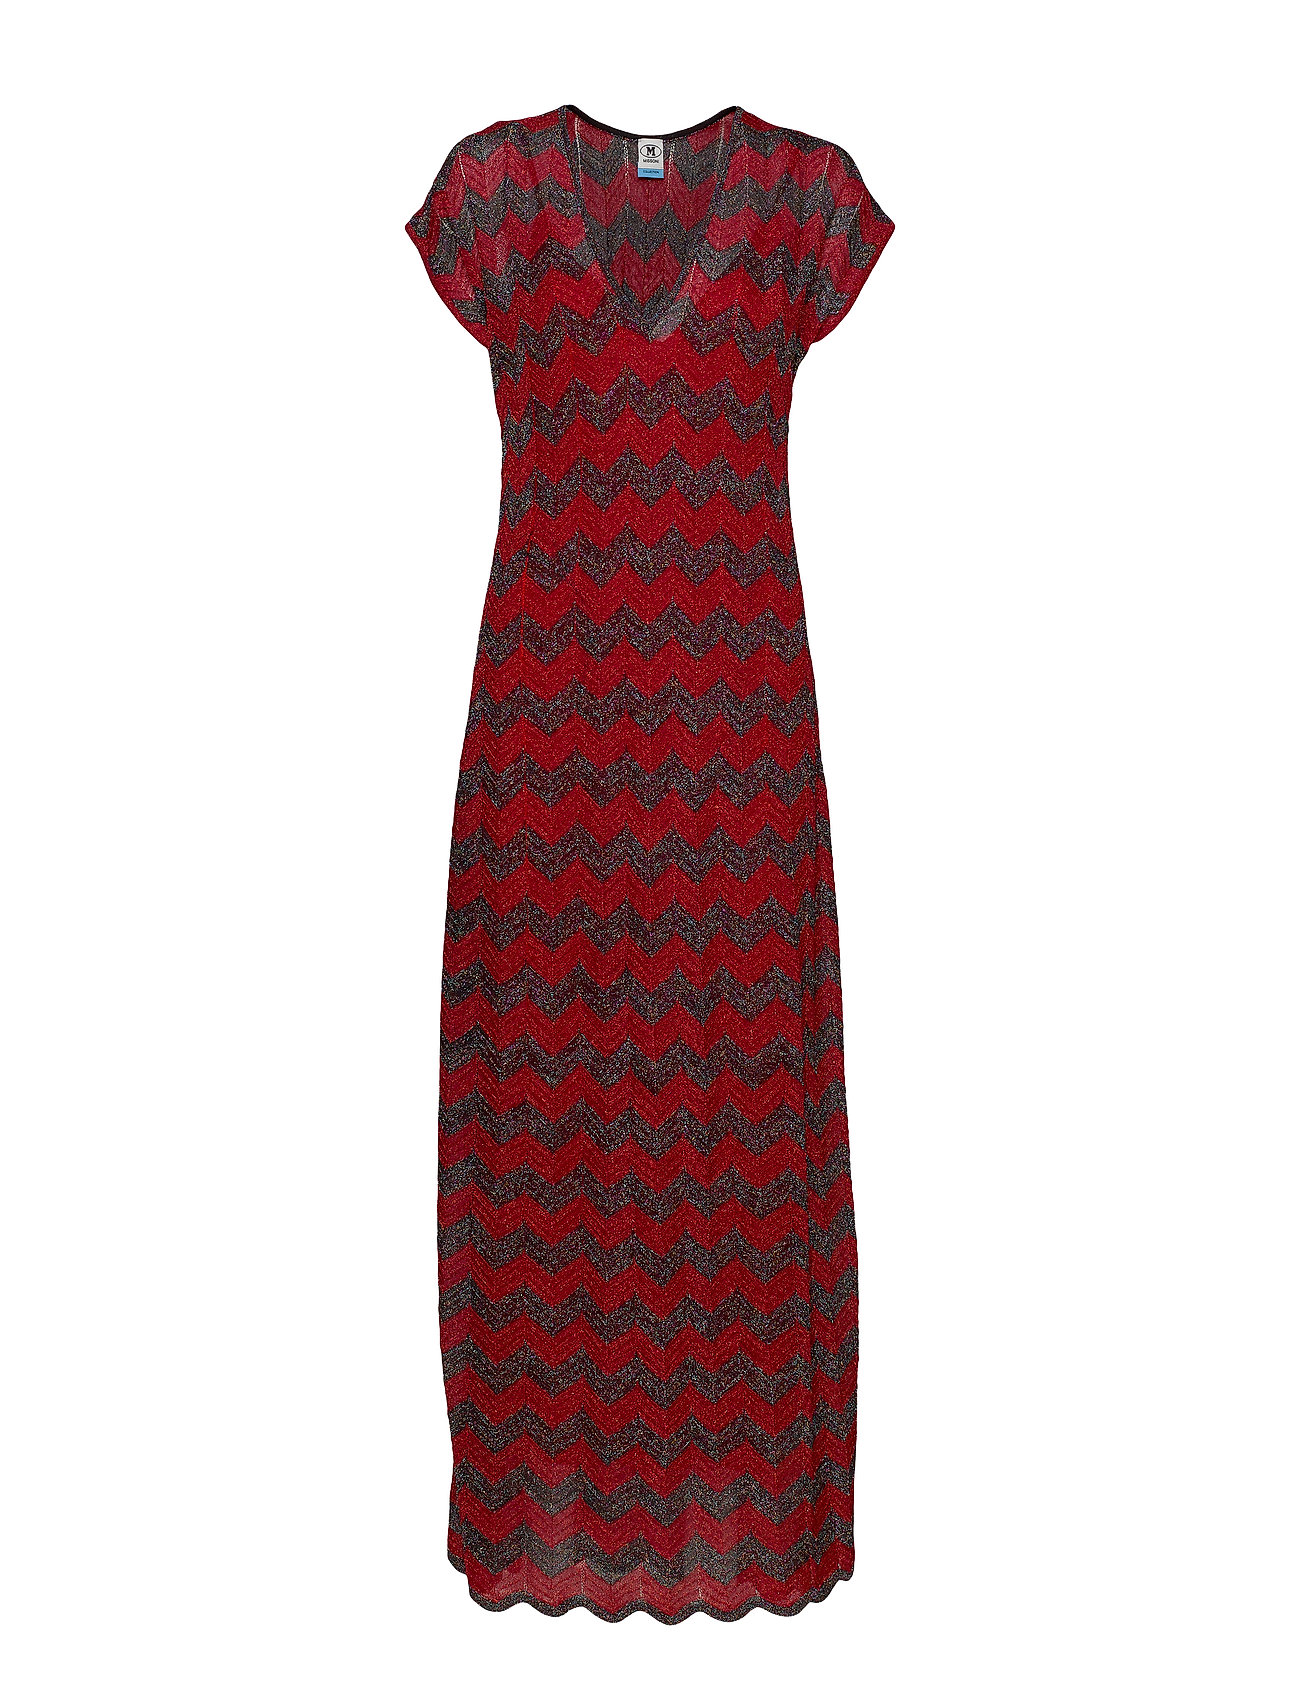 Image of M Missoni Long Dress Maxikjole Festkjole Rød M Missoni (3322698003)